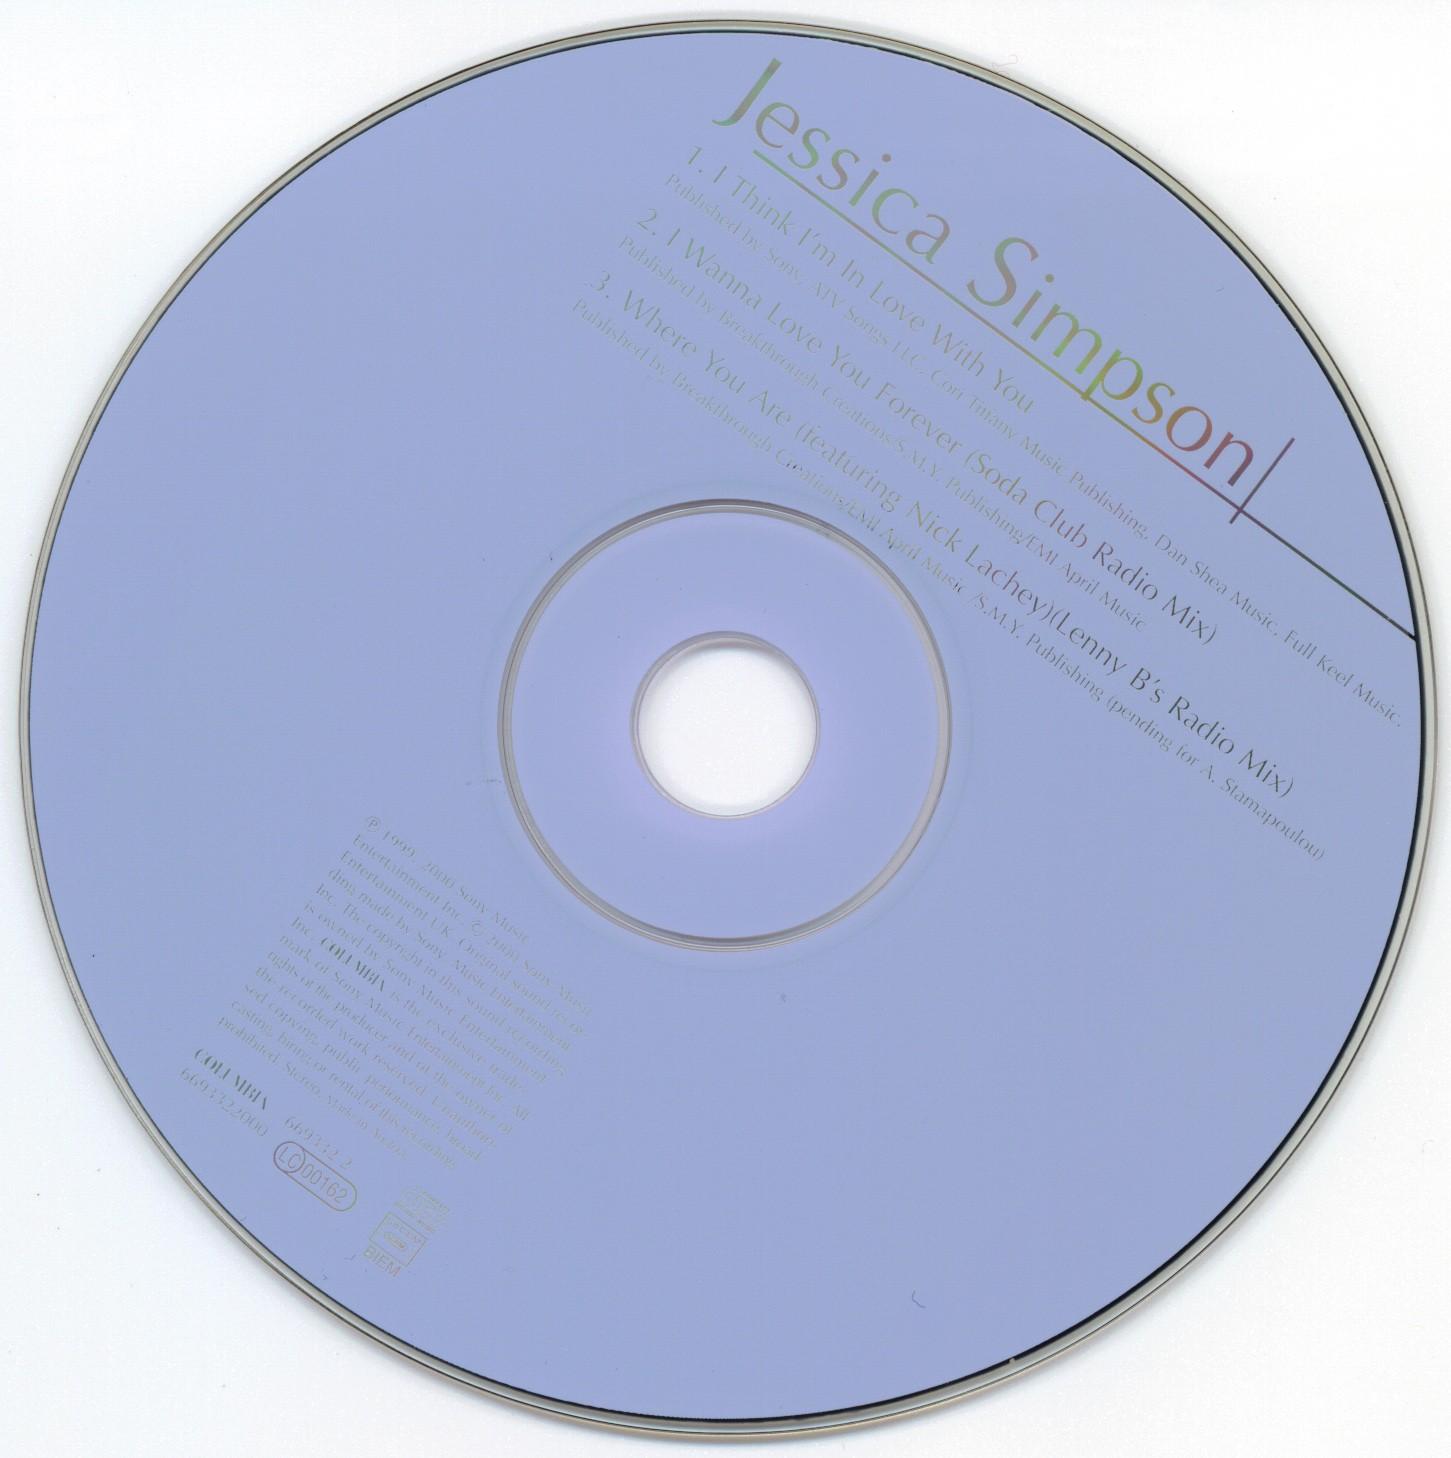 http://2.bp.blogspot.com/-bNbvWu_6JCE/T2N7xRGf0nI/AAAAAAAALo4/DeQ2b2g1ZmQ/s1600/%255BAllCDCovers%255D_jessica_simpson_i_think_im_in_love_with_you_2000_retail_cd-cd.jpg